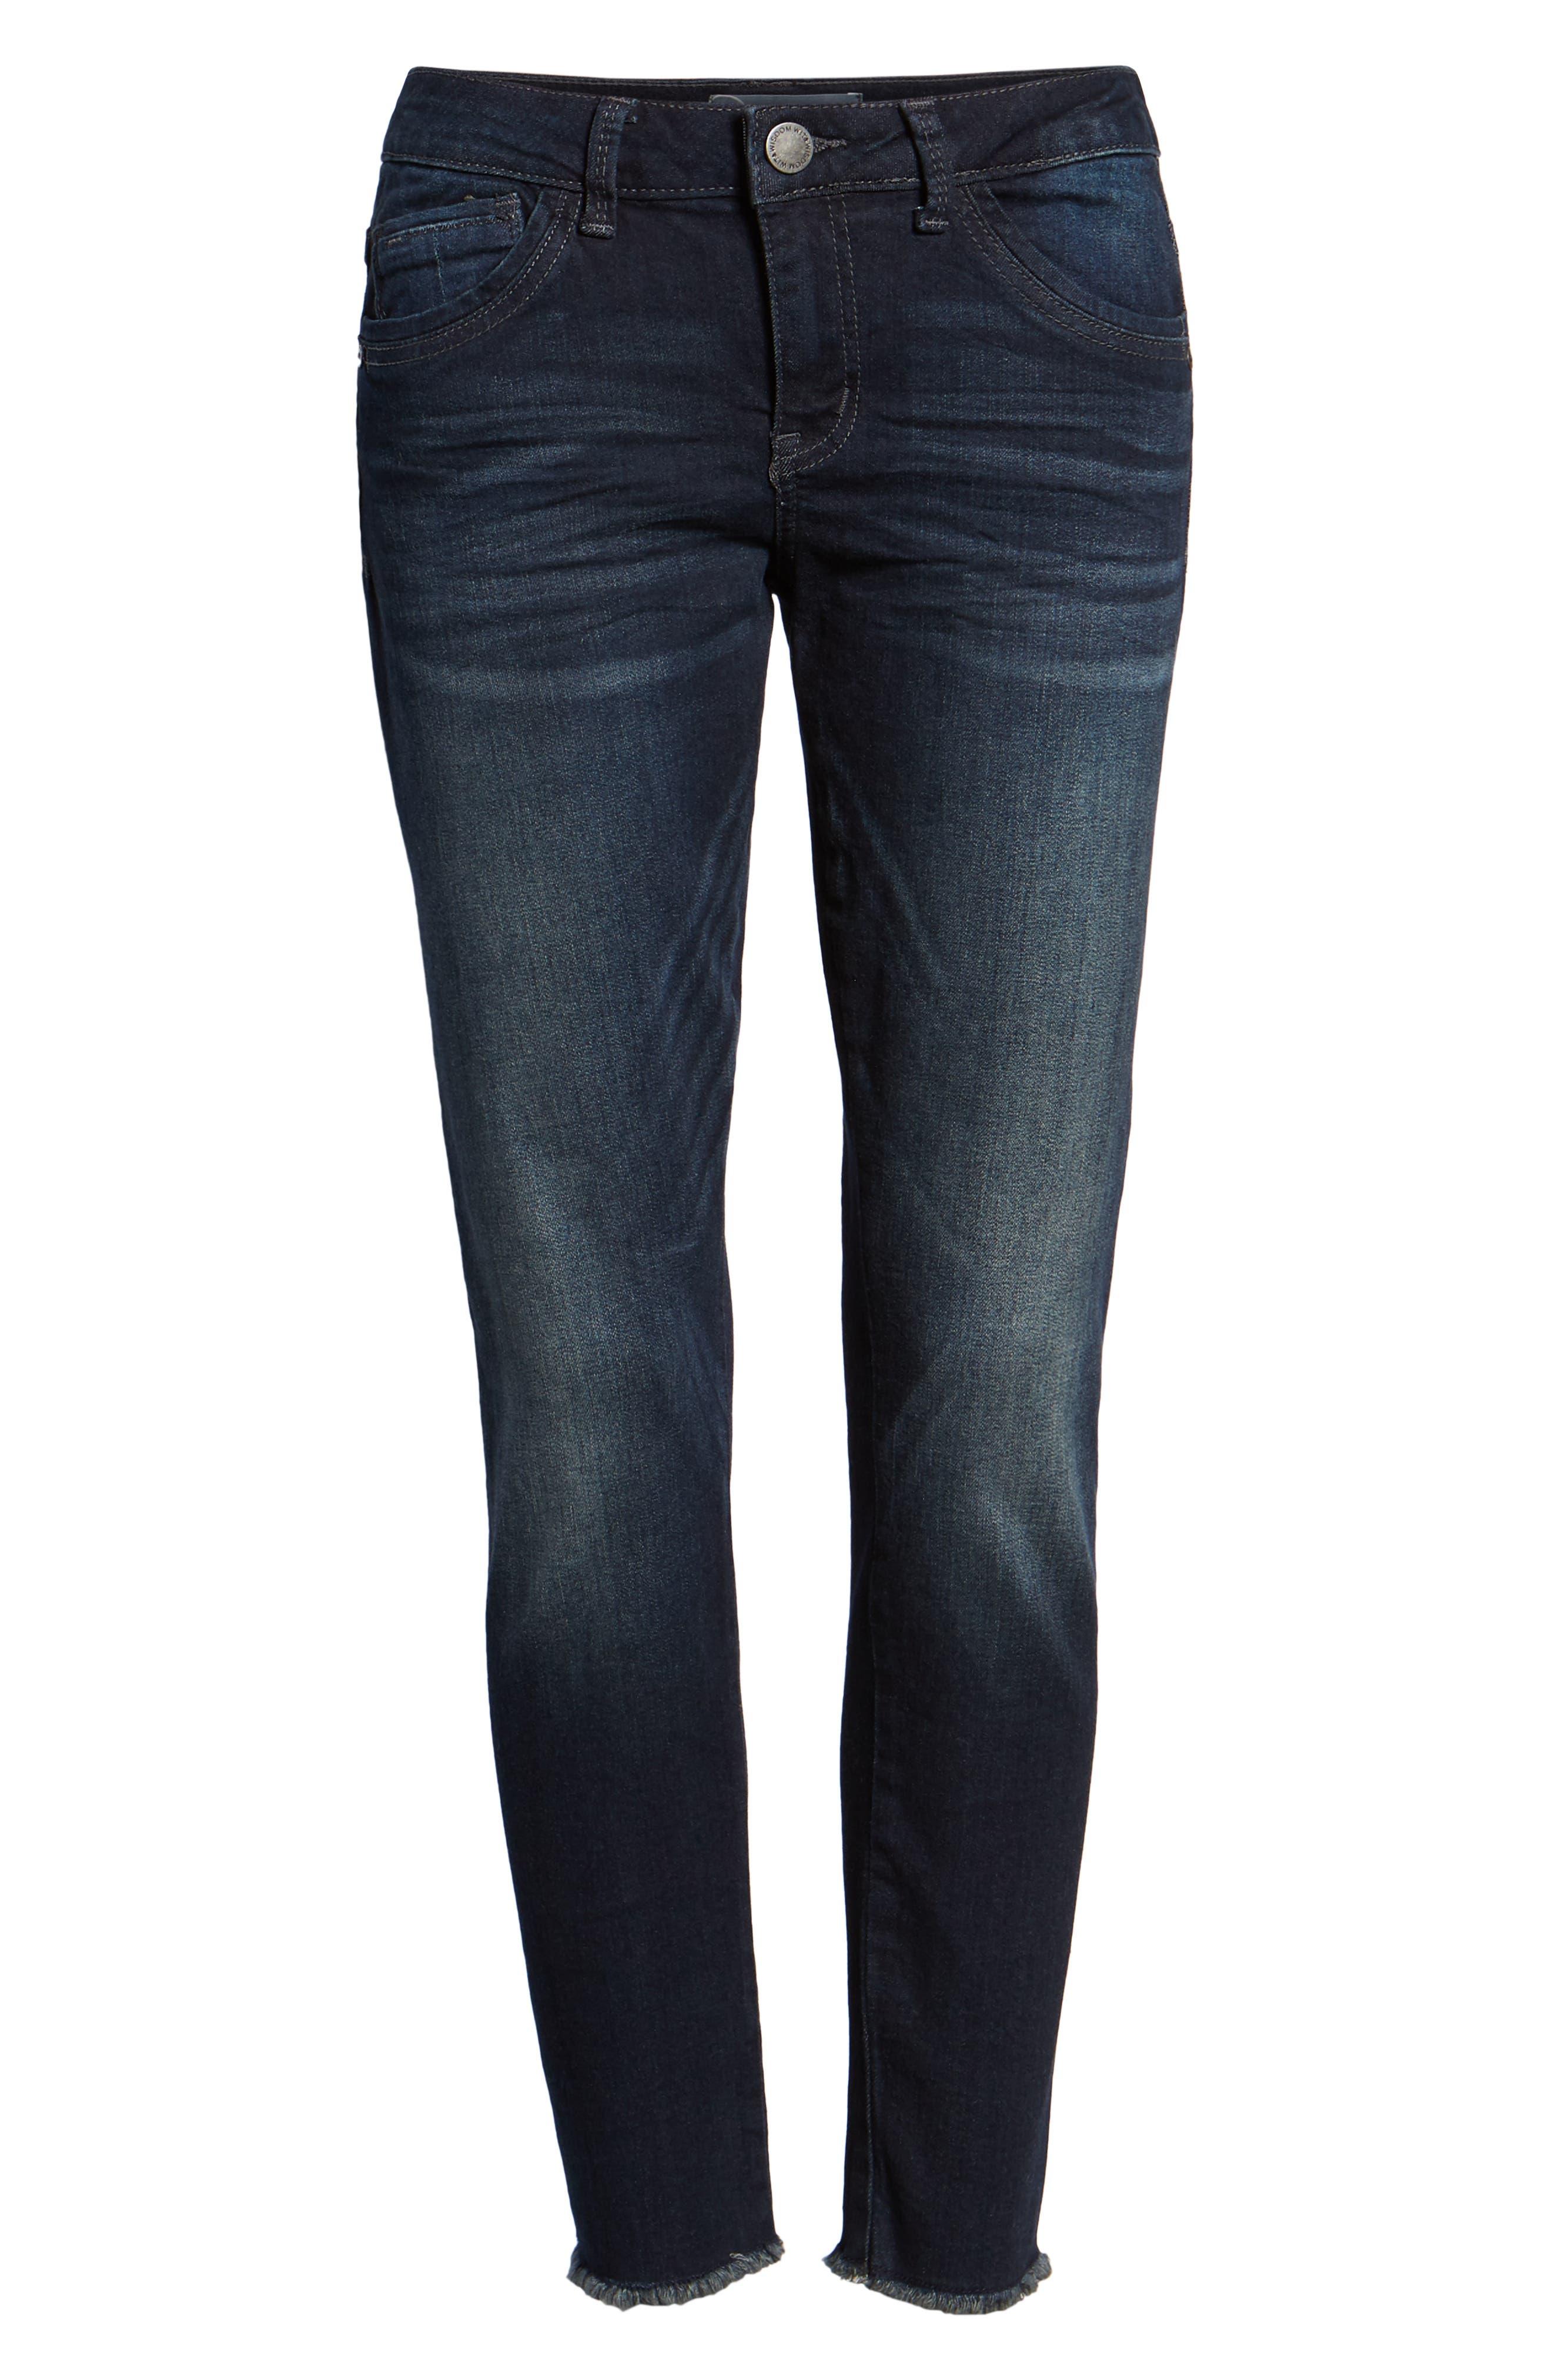 Seamless Ankle Skimmer Jeans,                             Alternate thumbnail 7, color,                             INDIGO